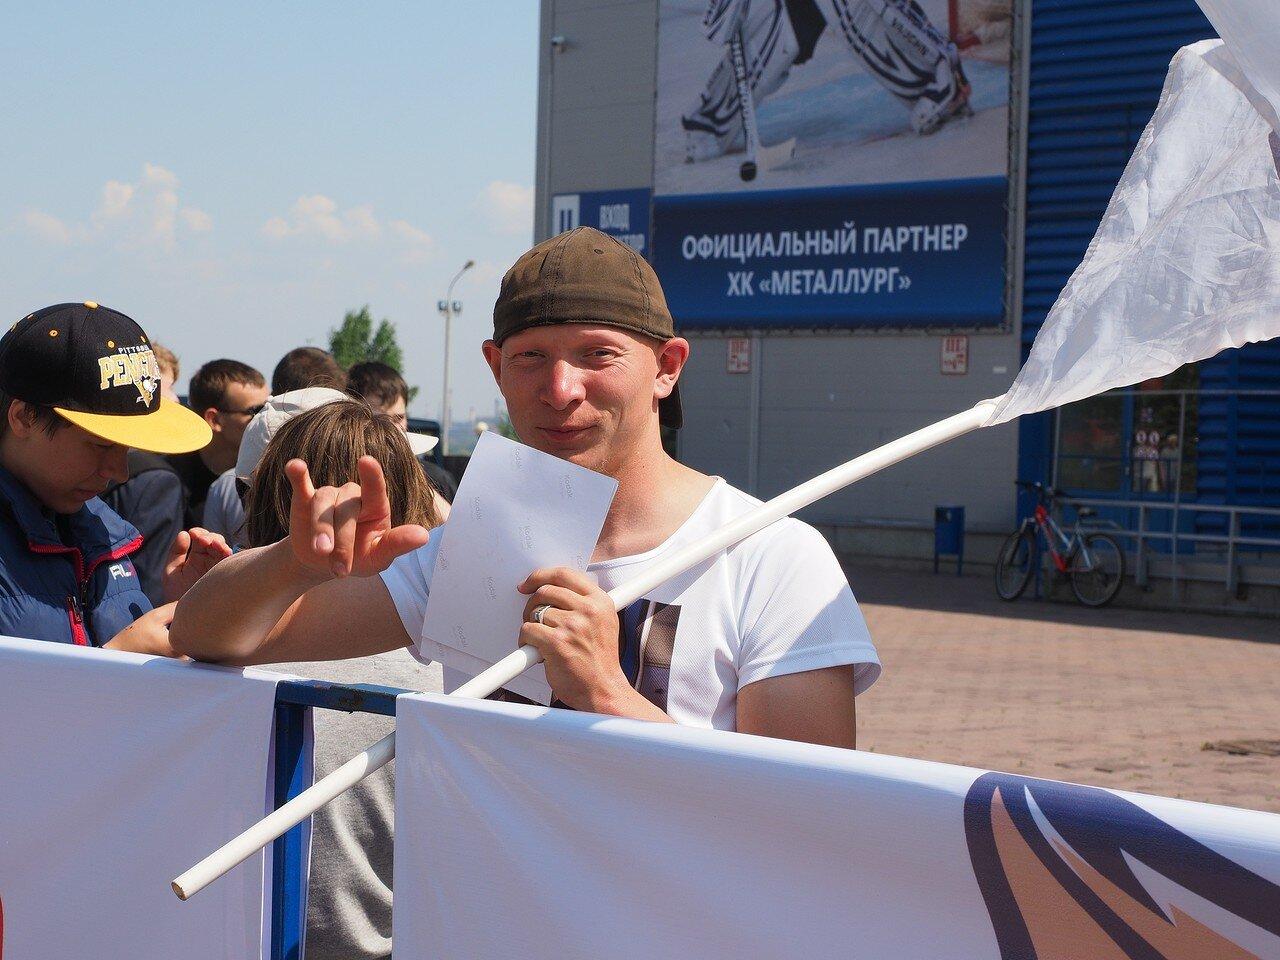 9Церемония чествования команды Металлург27.05.2016